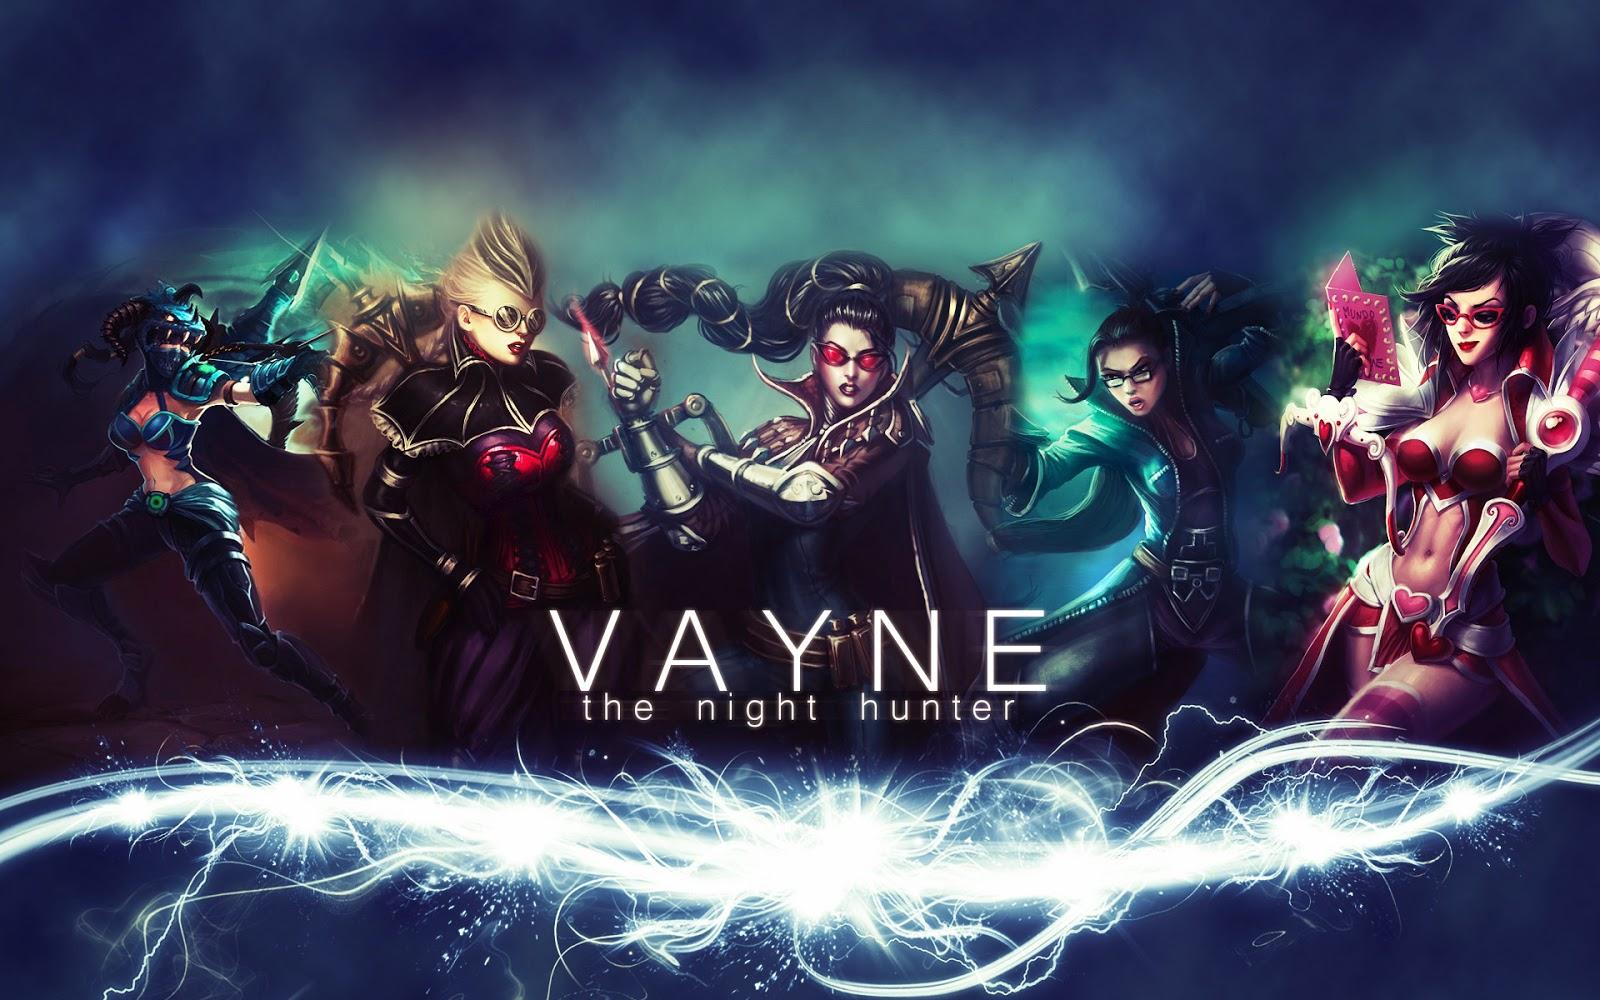 Lol Wallpapers: Vayne League Of Legends Wallpaper, Vayne Desktop Wallpaper